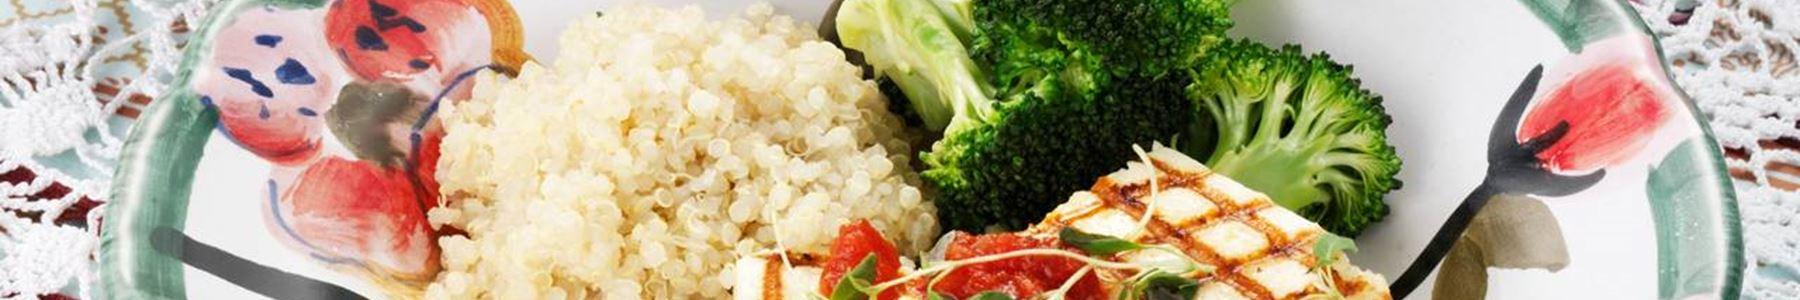 Vegetarisk + Broccoli + Quinoa